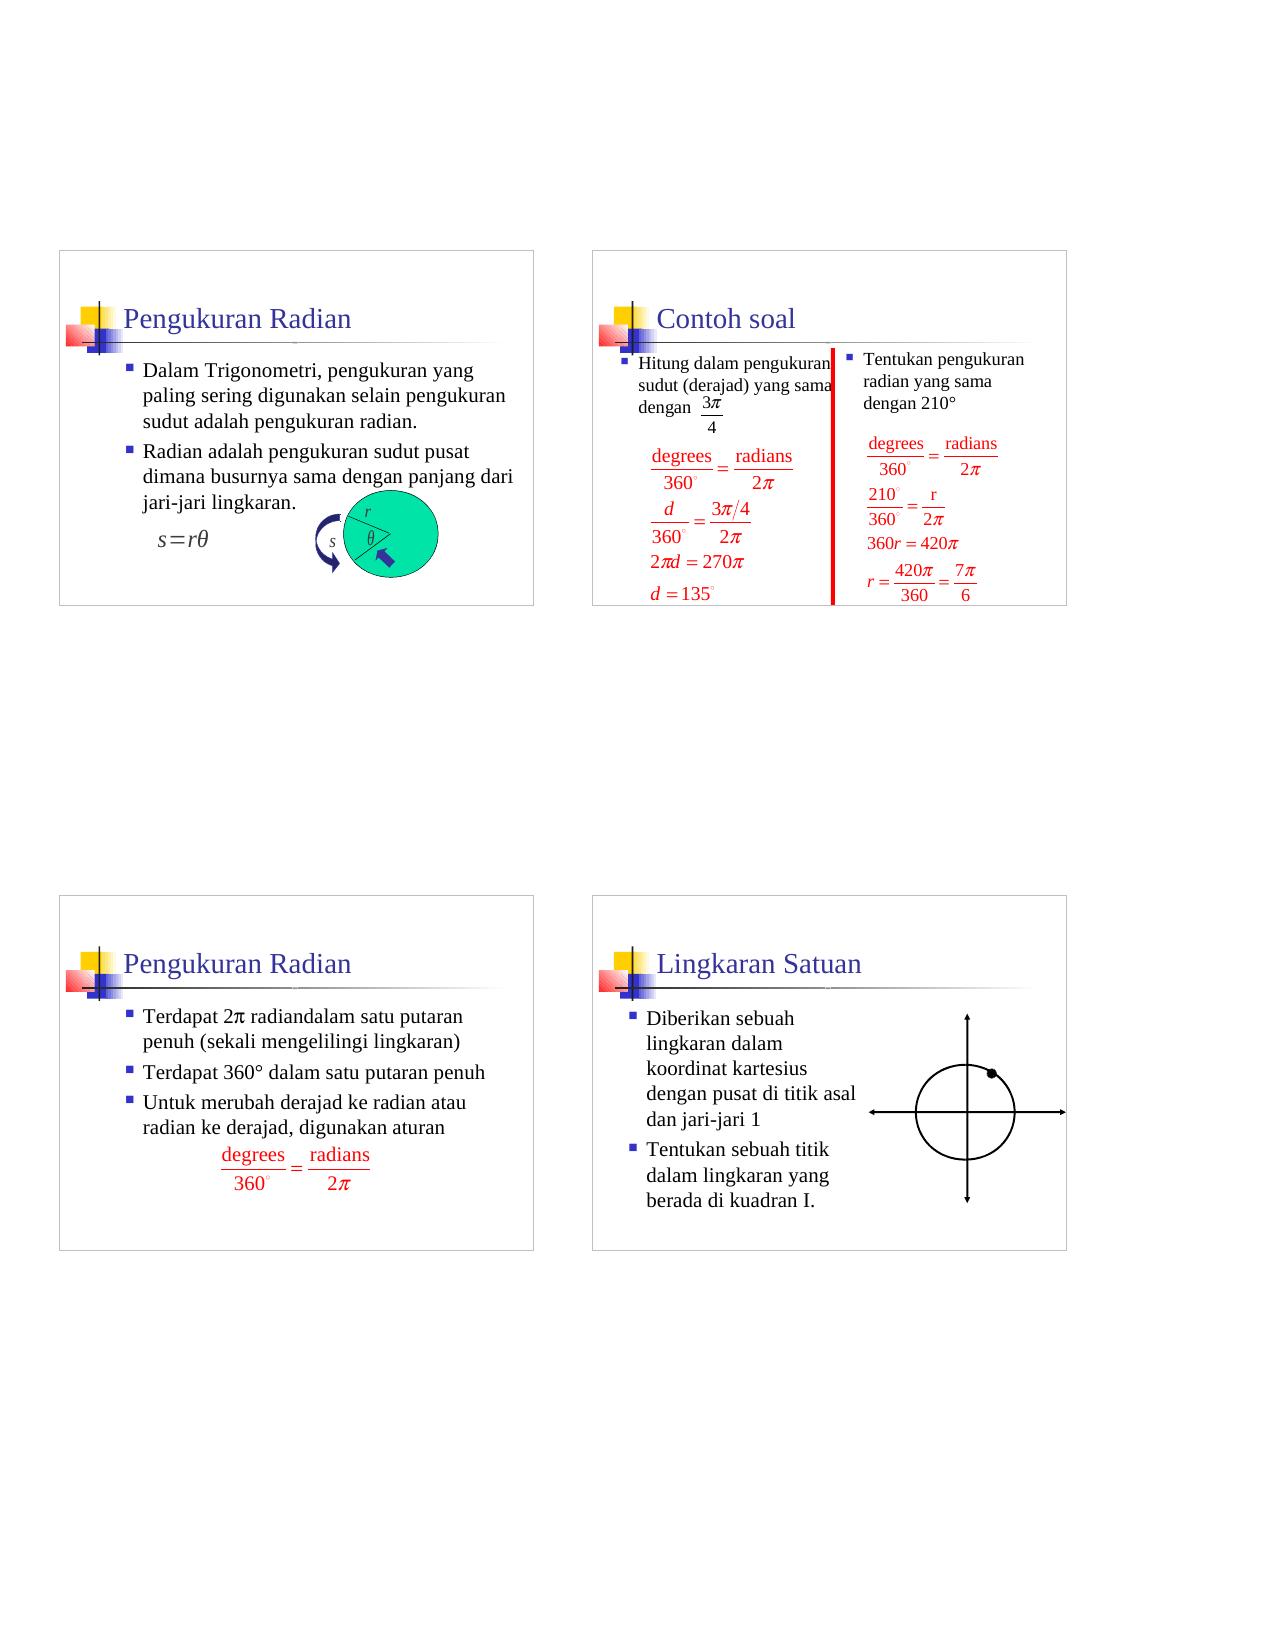 Pengukuran Radian Pengukuran Radian Contoh Soal Lingkaran